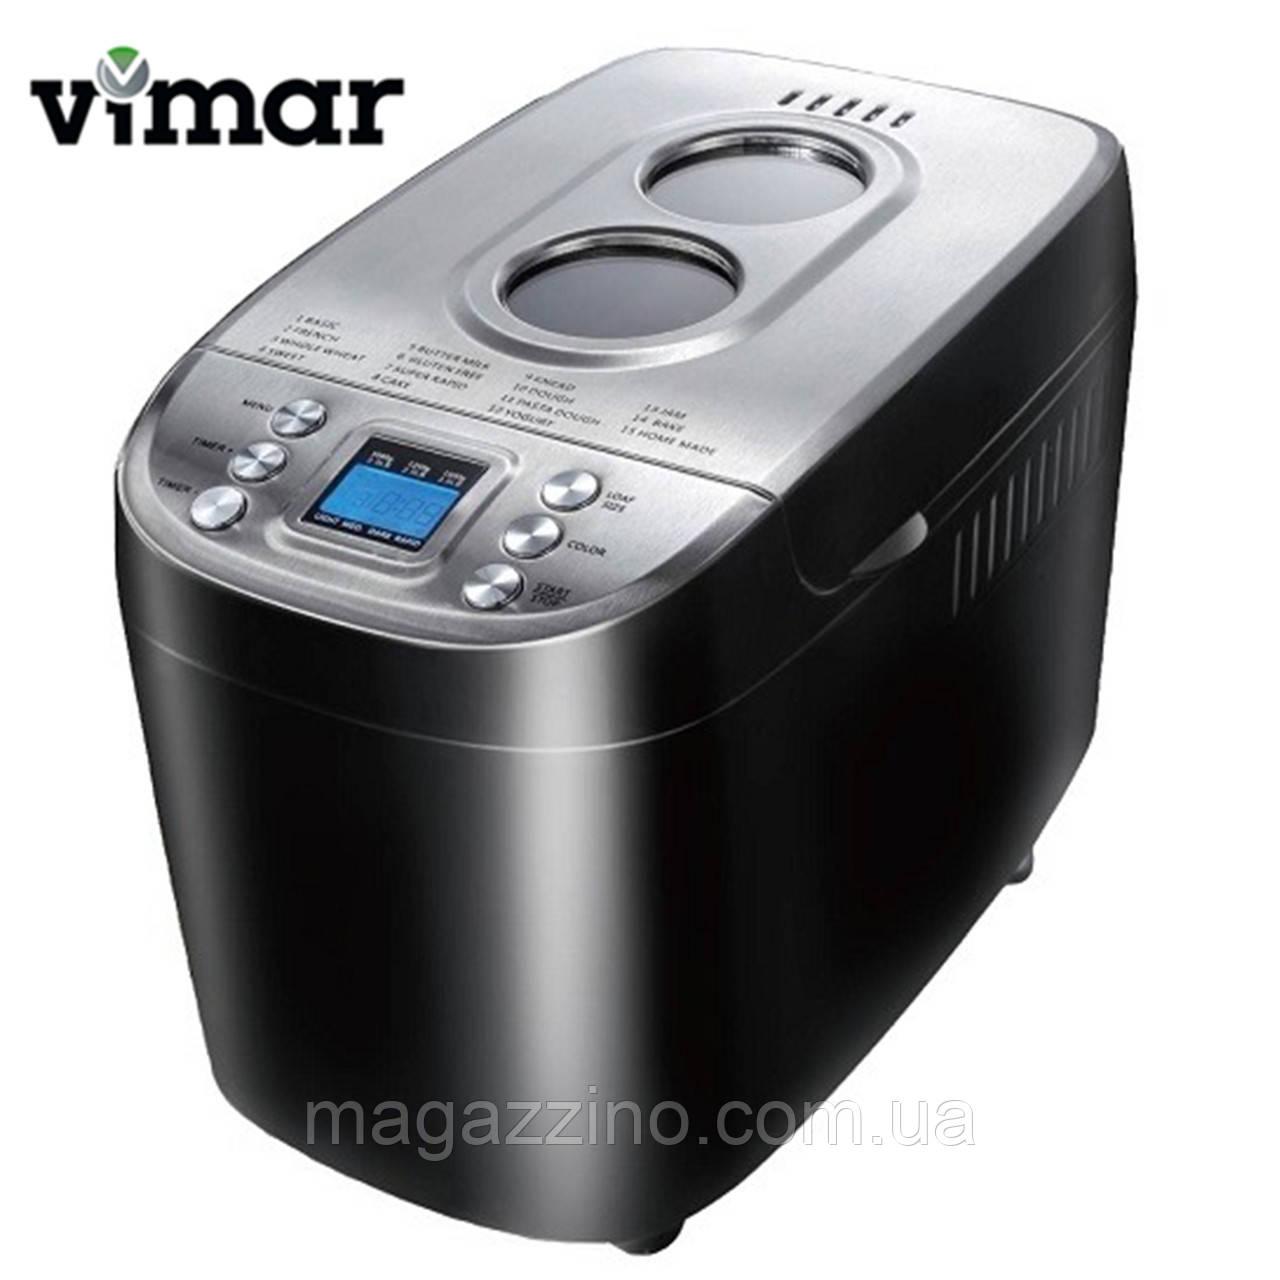 Електрична плита настільна хлібопічка, Vimar VBM-725, 850 Вт.